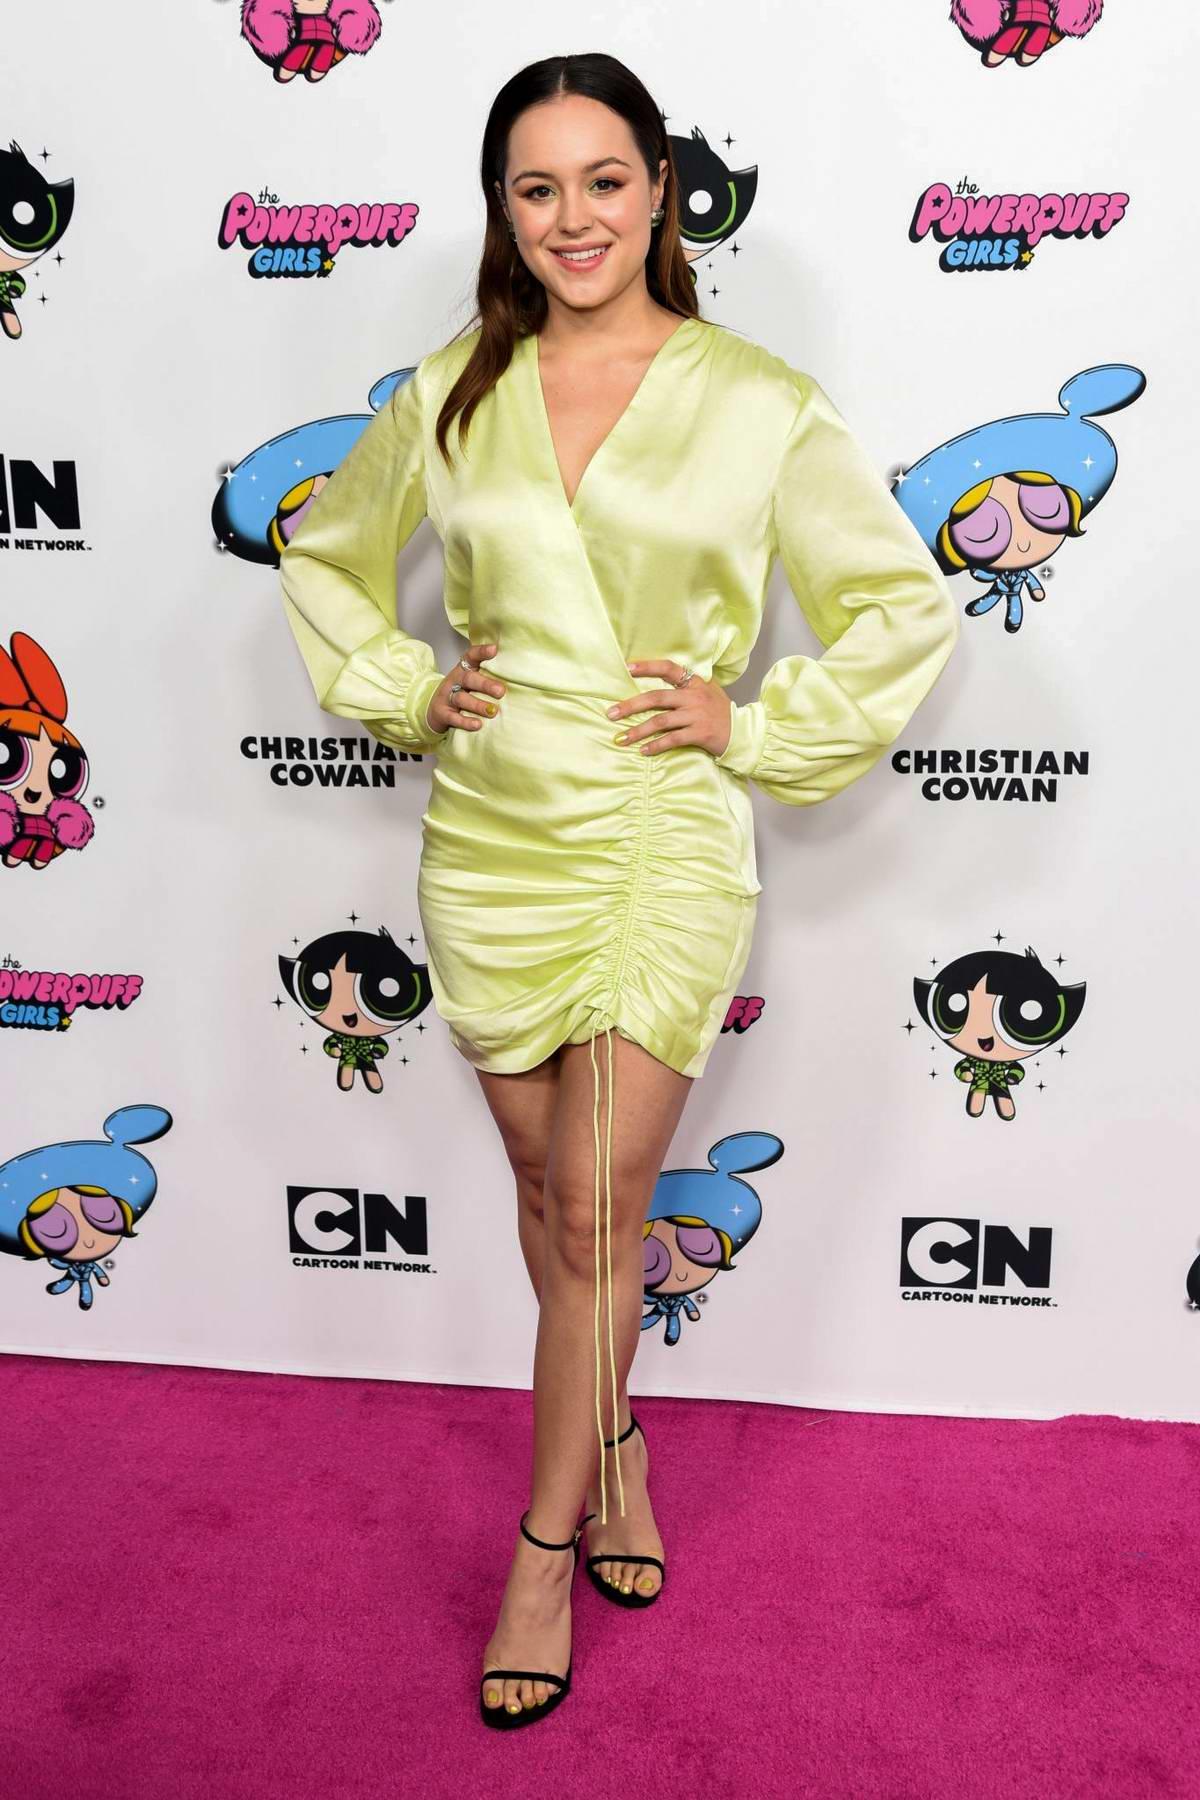 Hayley Orantia attends Christian Cowan x Powerpuff Girls Runway Show in Hollywood, California